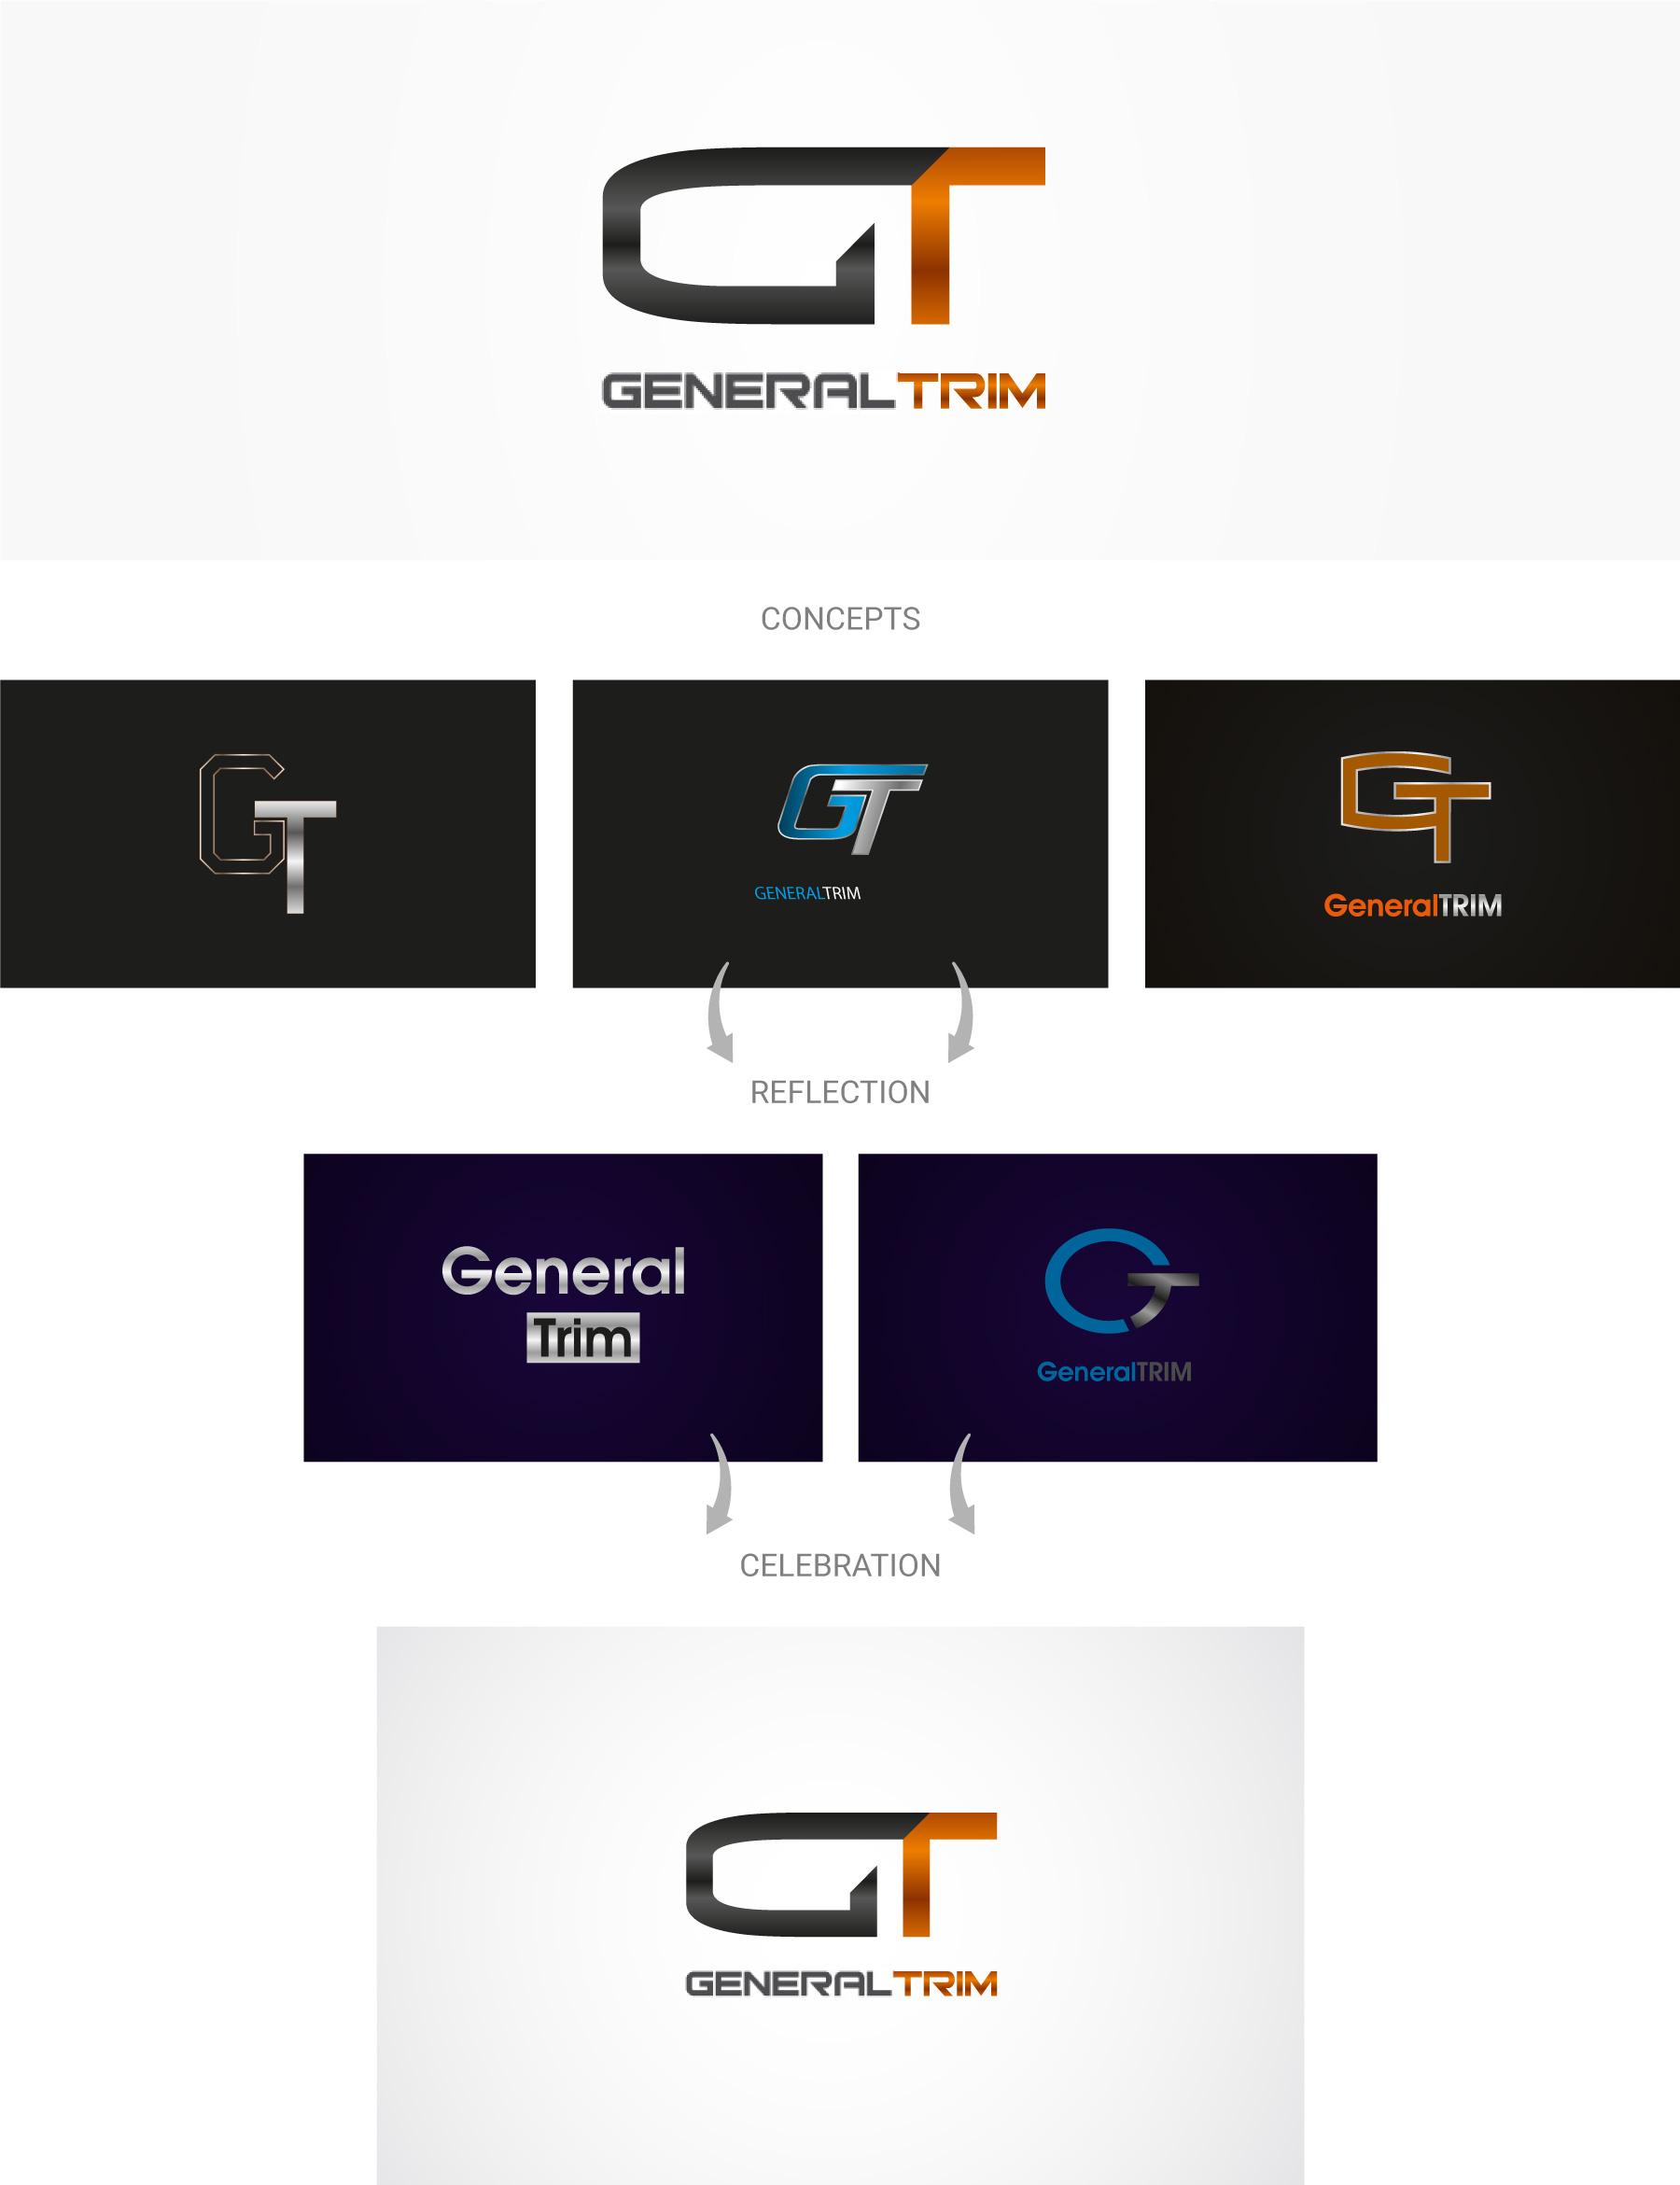 General-trim-logo-design